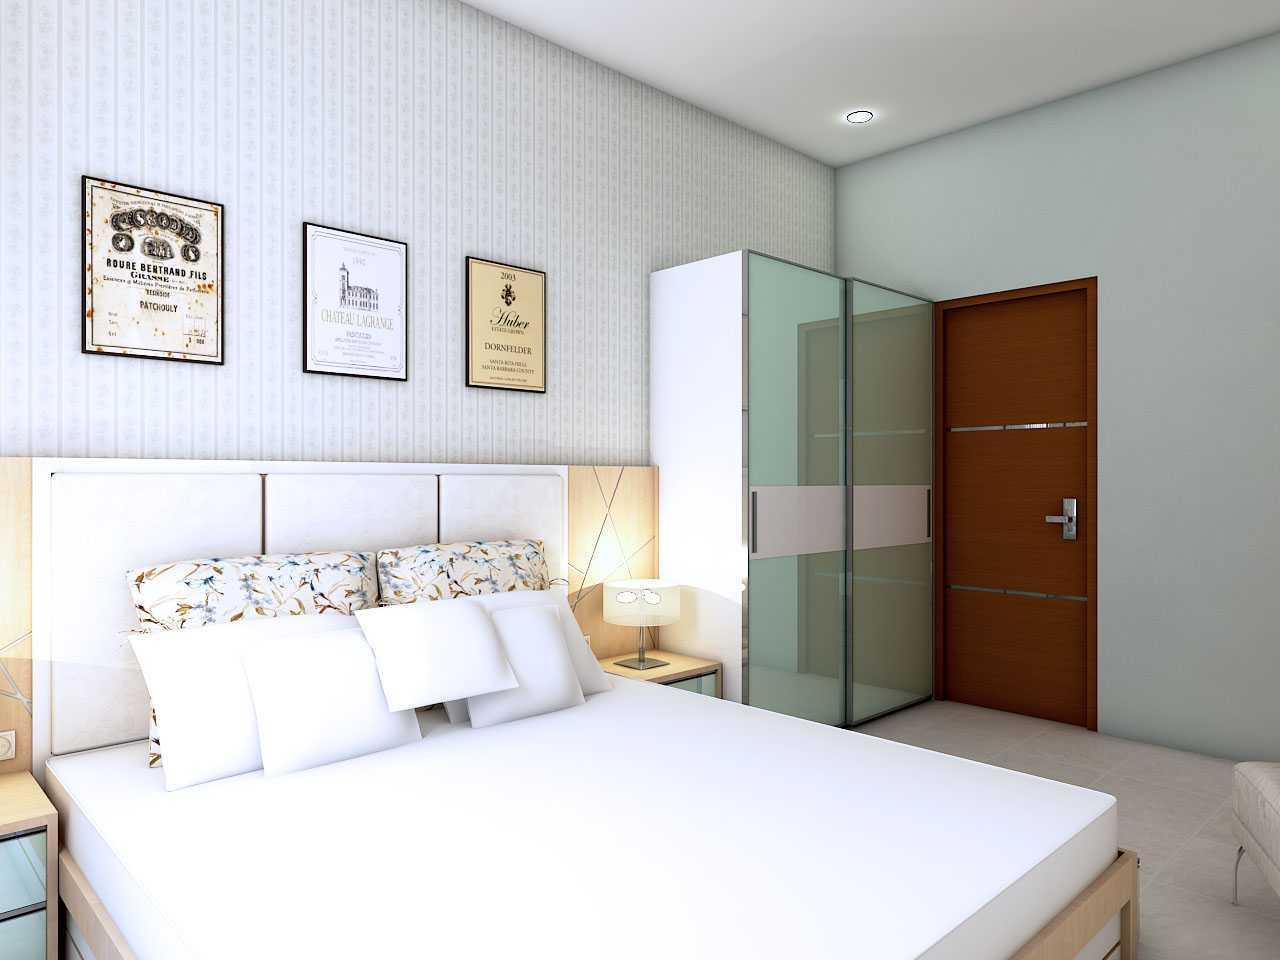 Arteta Interior Design & Furniture Master Bed Room Modern Minimalis Surakarta, Kota Surakarta, Jawa Tengah, Indonesia Surakarta, Kota Surakarta, Jawa Tengah, Indonesia Bedroom  41191